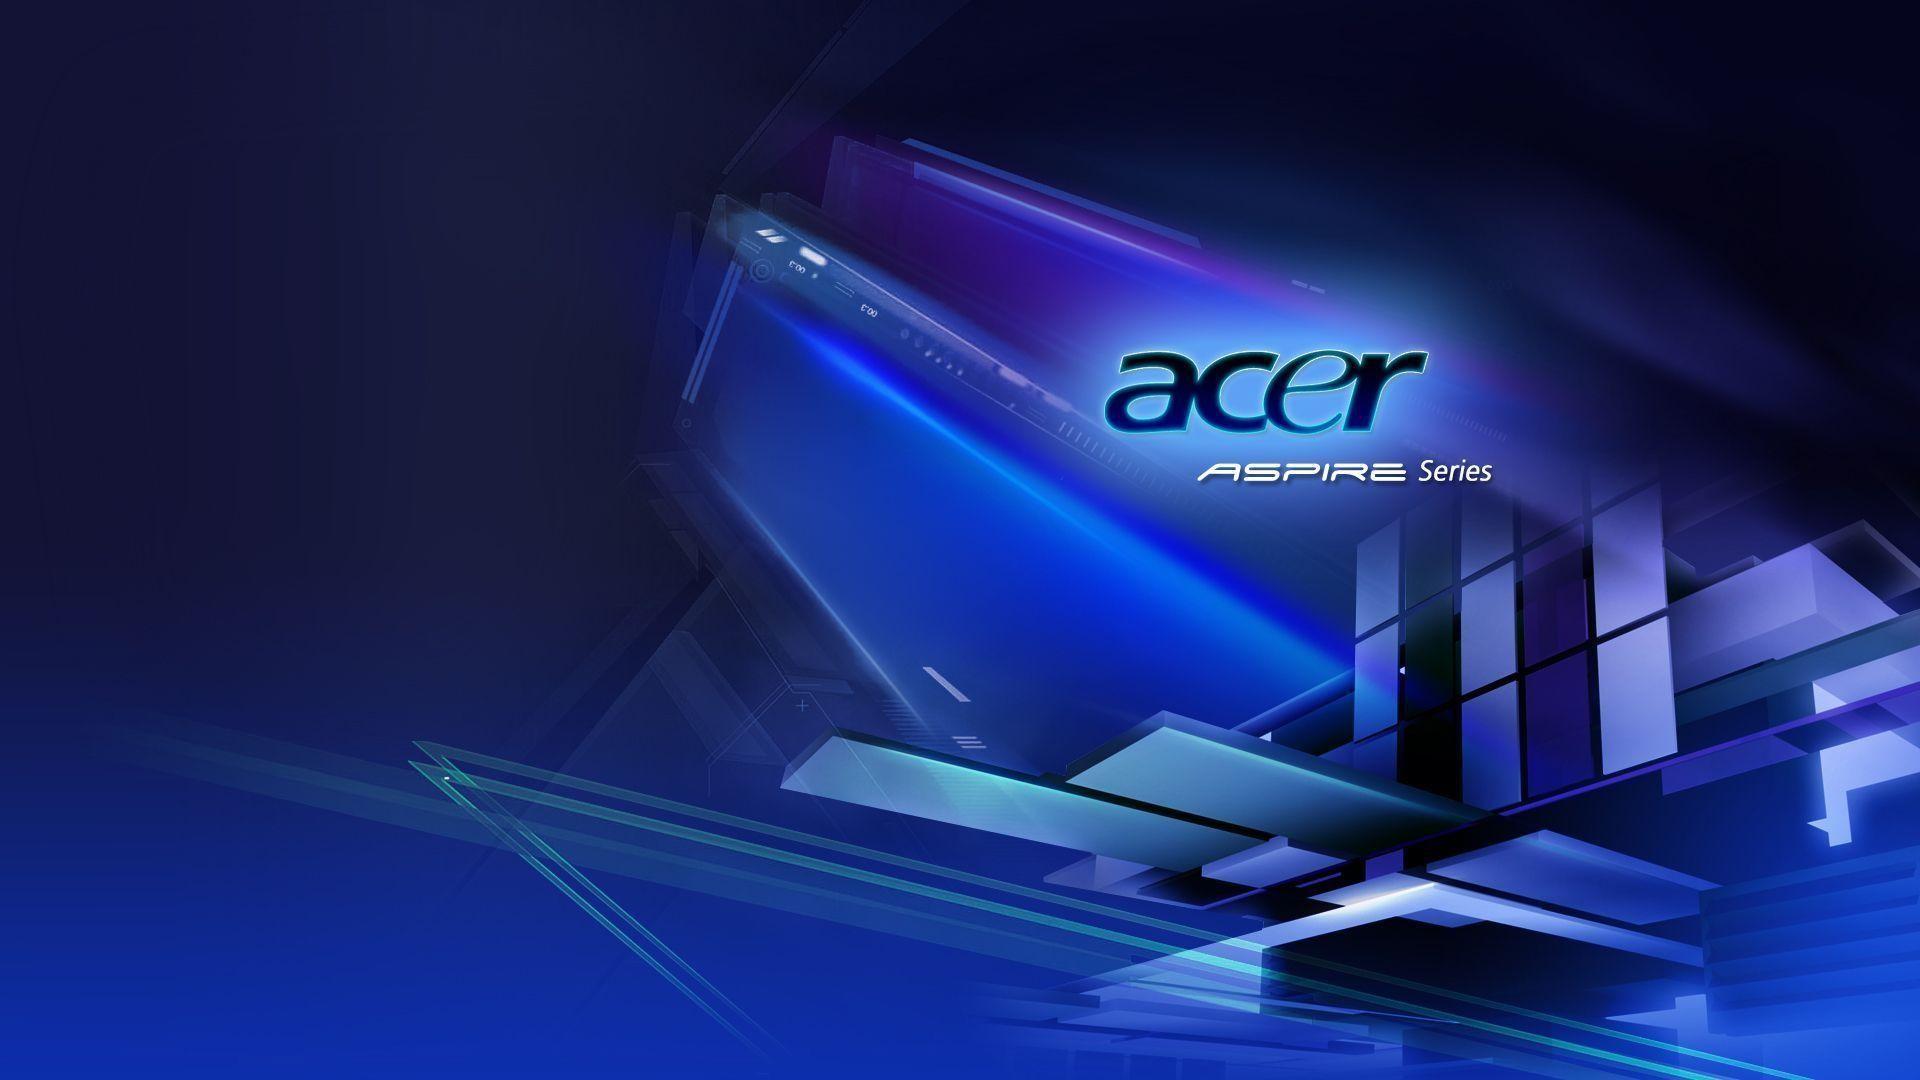 Windows Toshiba Laptop Acer Wallpaper px Free Download .